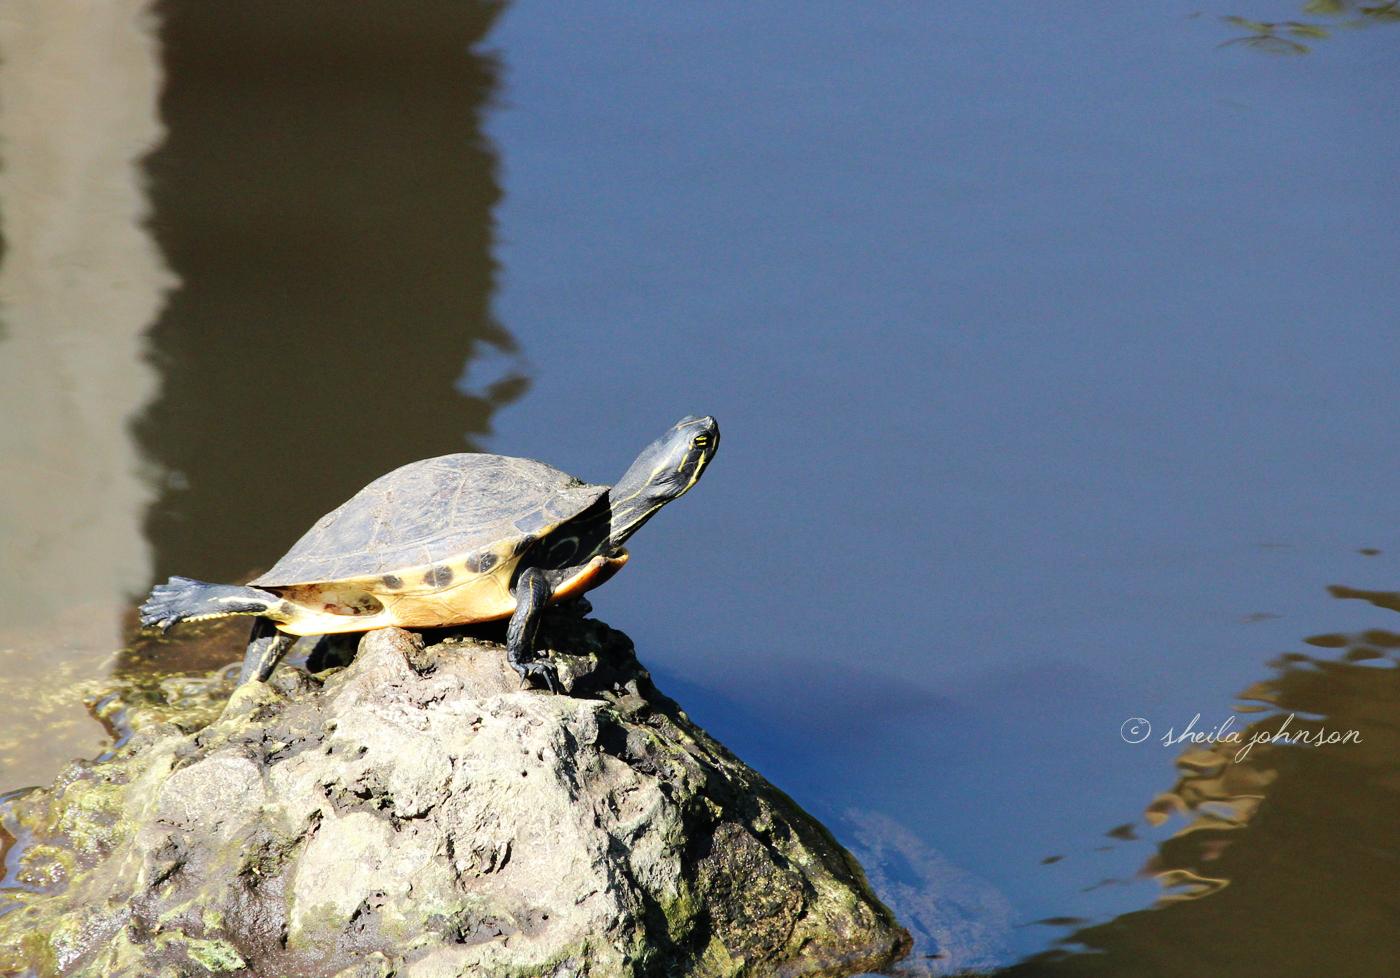 A Little Pond Slider Turtle Appears To Be Doing Yoga On A Rock Near The Retention Pond At Kiplinger Preserve, Stuart, Florida.